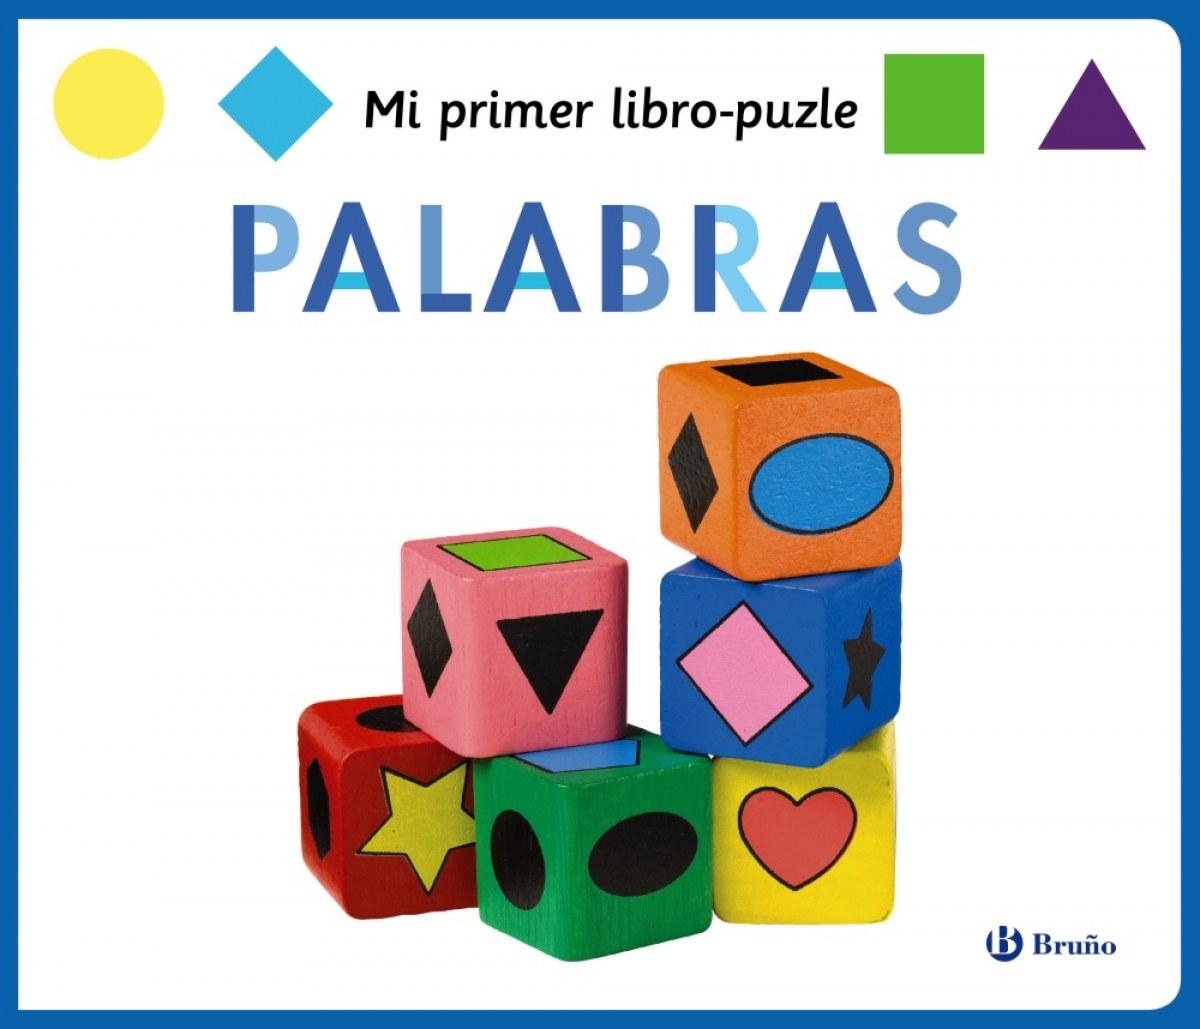 PALABRAS 9788469622902